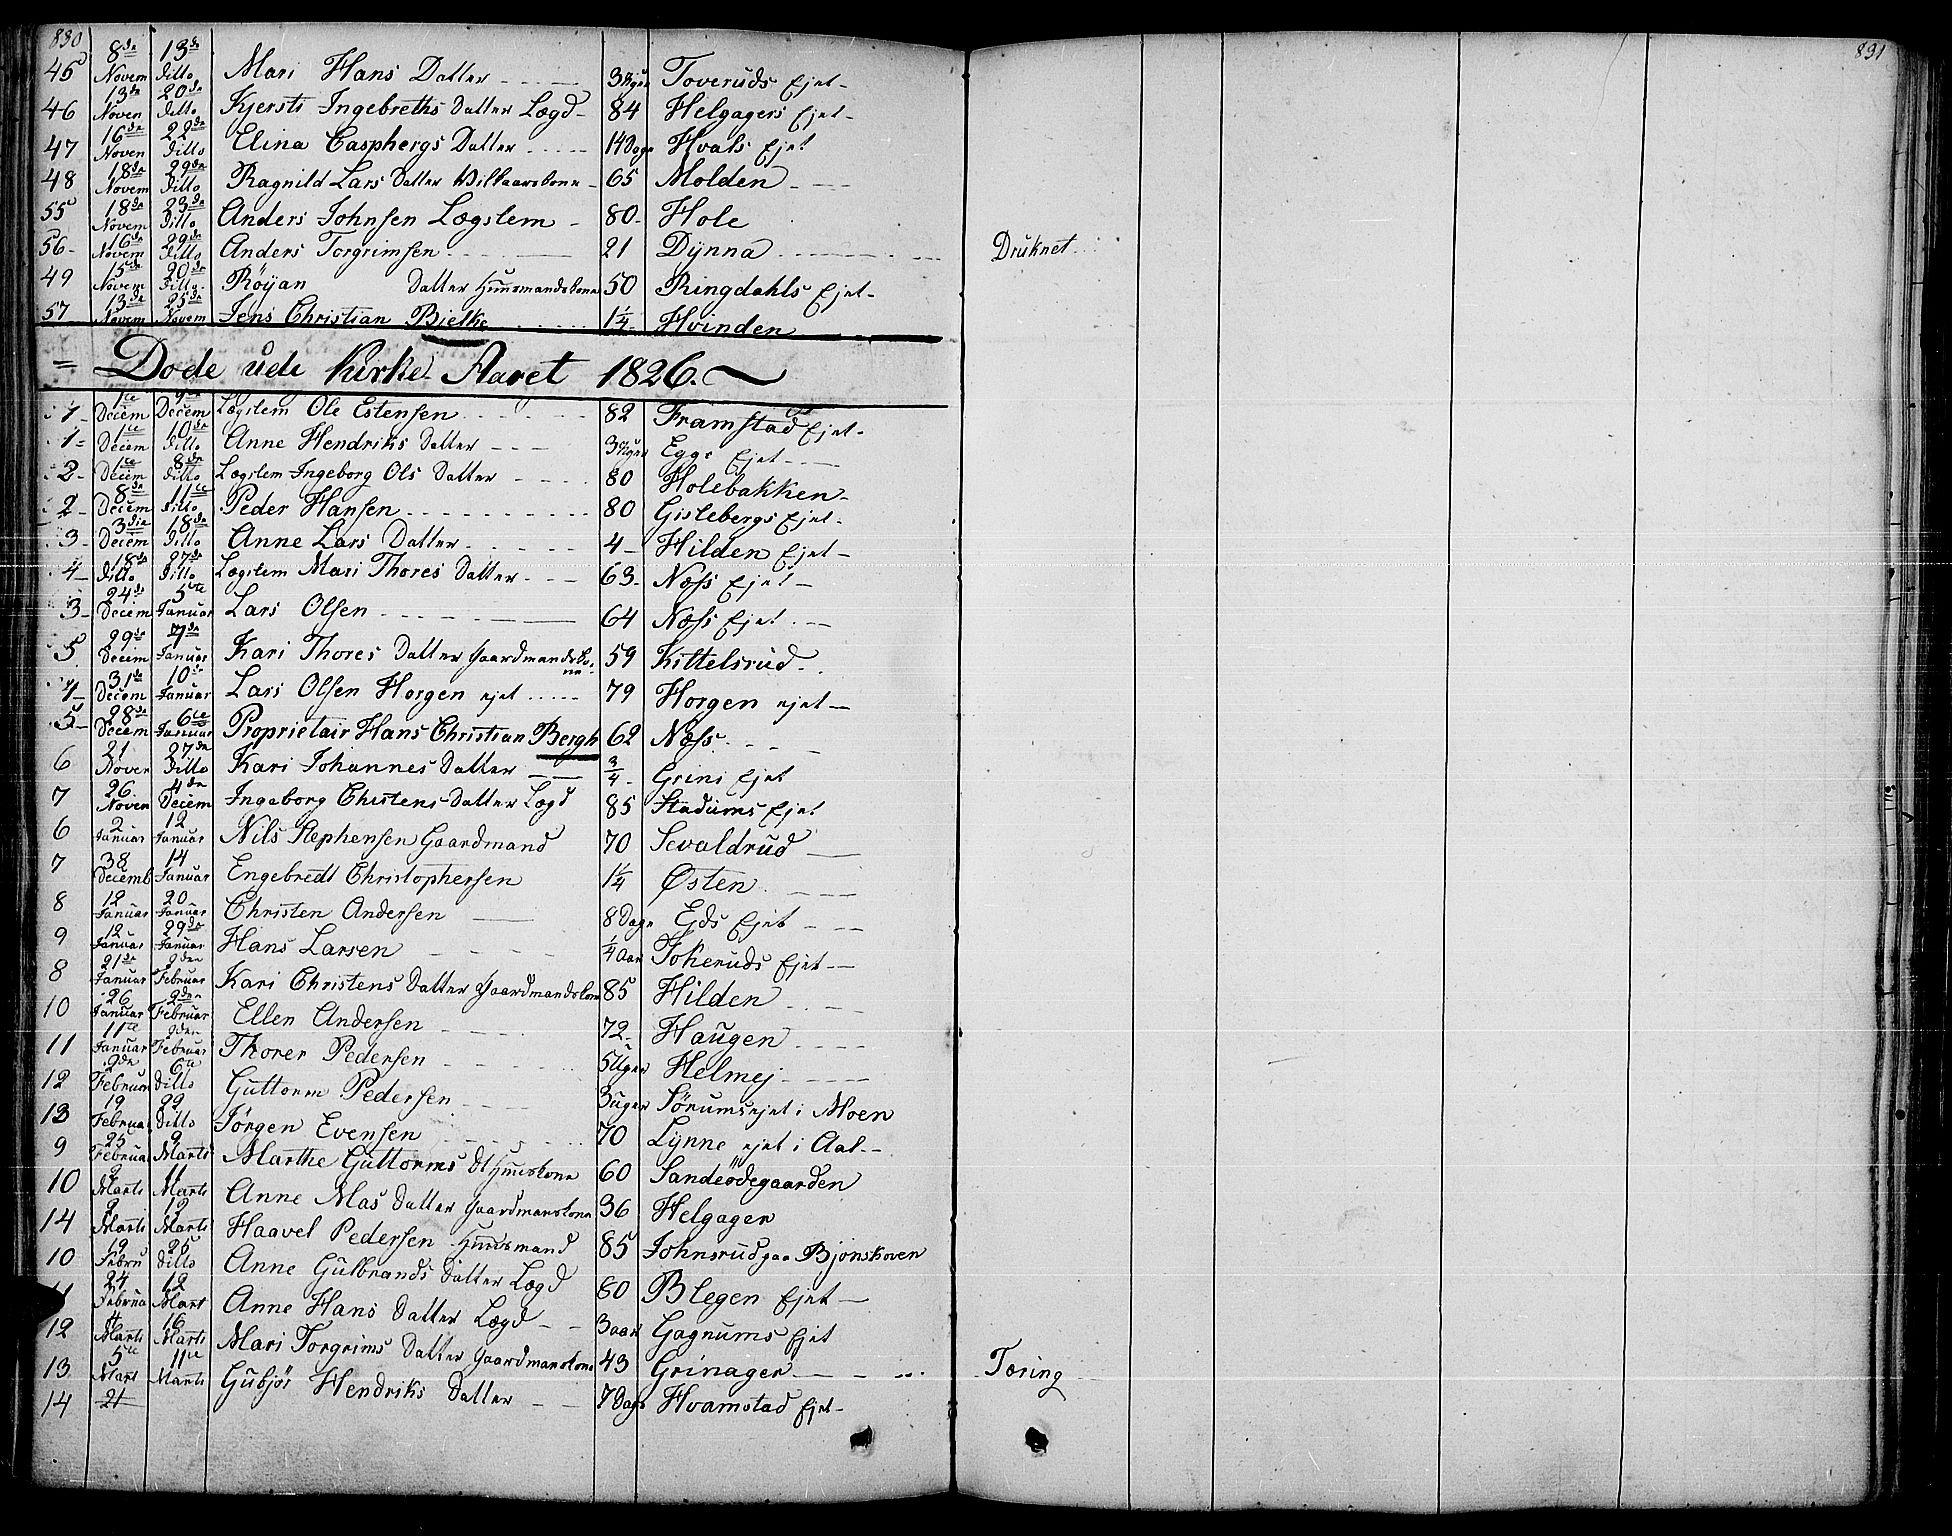 SAH, Gran prestekontor, Ministerialbok nr. 10, 1824-1842, s. 830-831